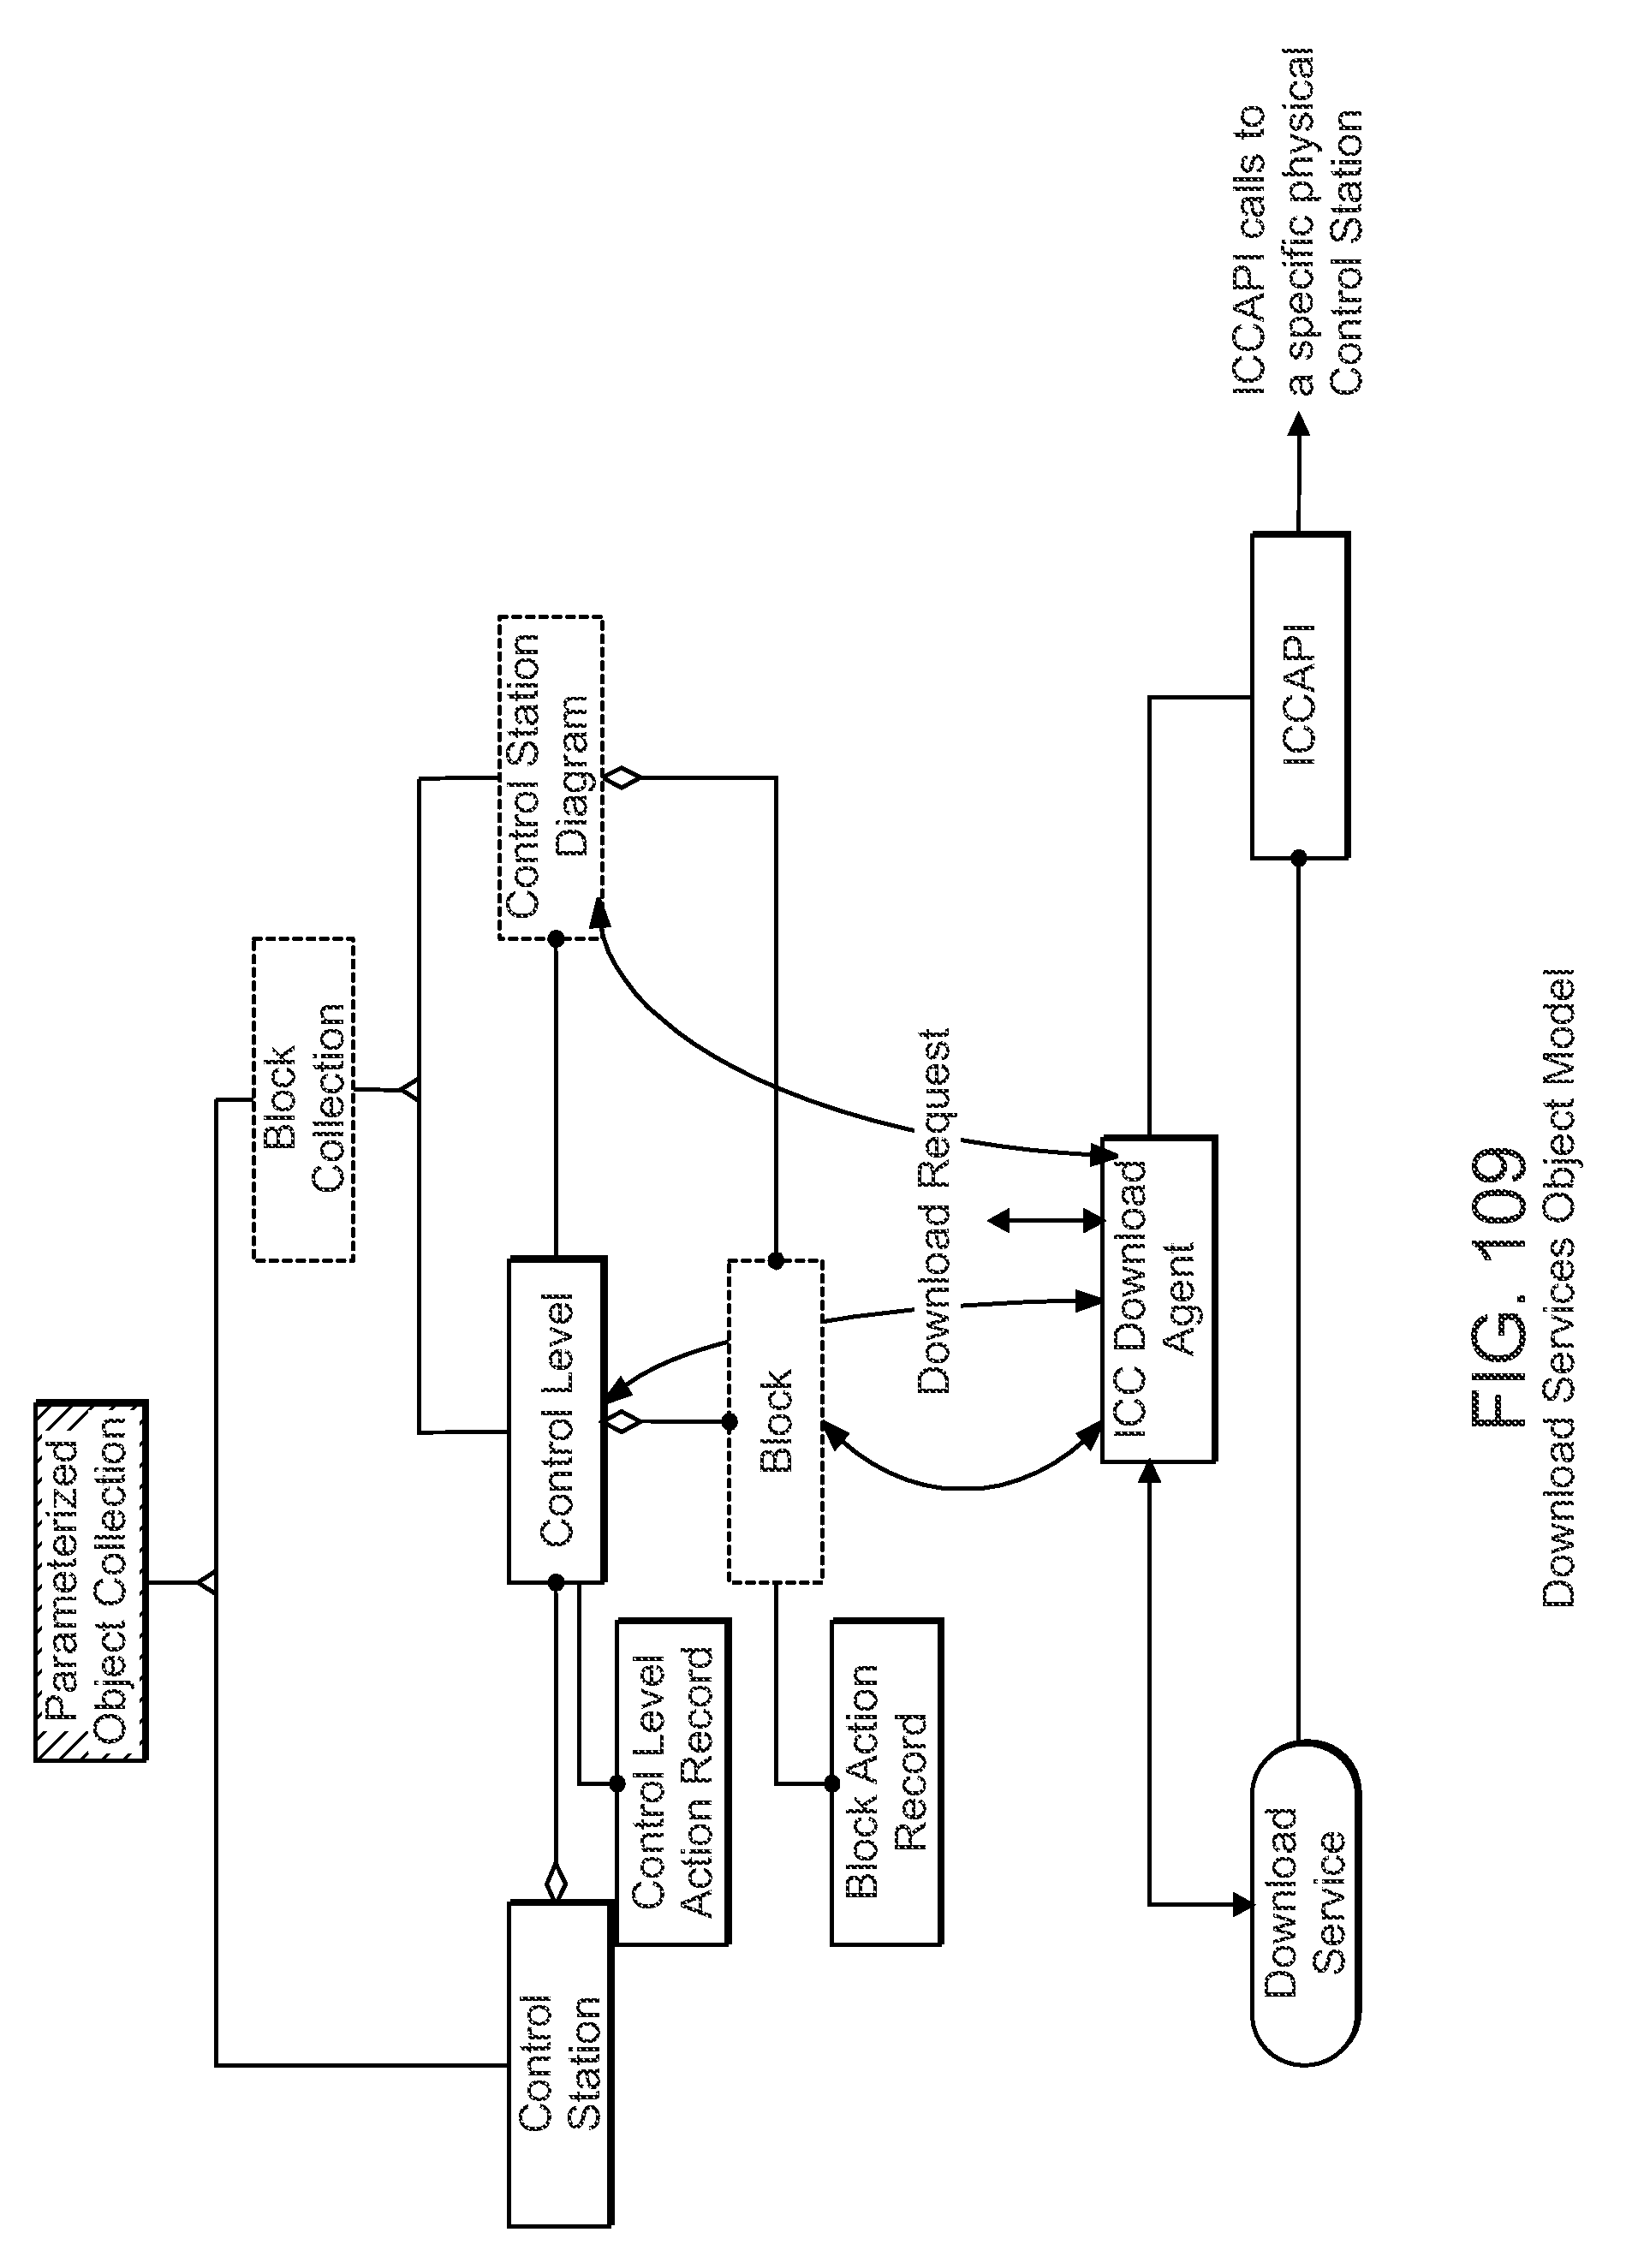 Patent Us 8229579 B2 Icc Data Module Wiring Diagram 0 Petitions